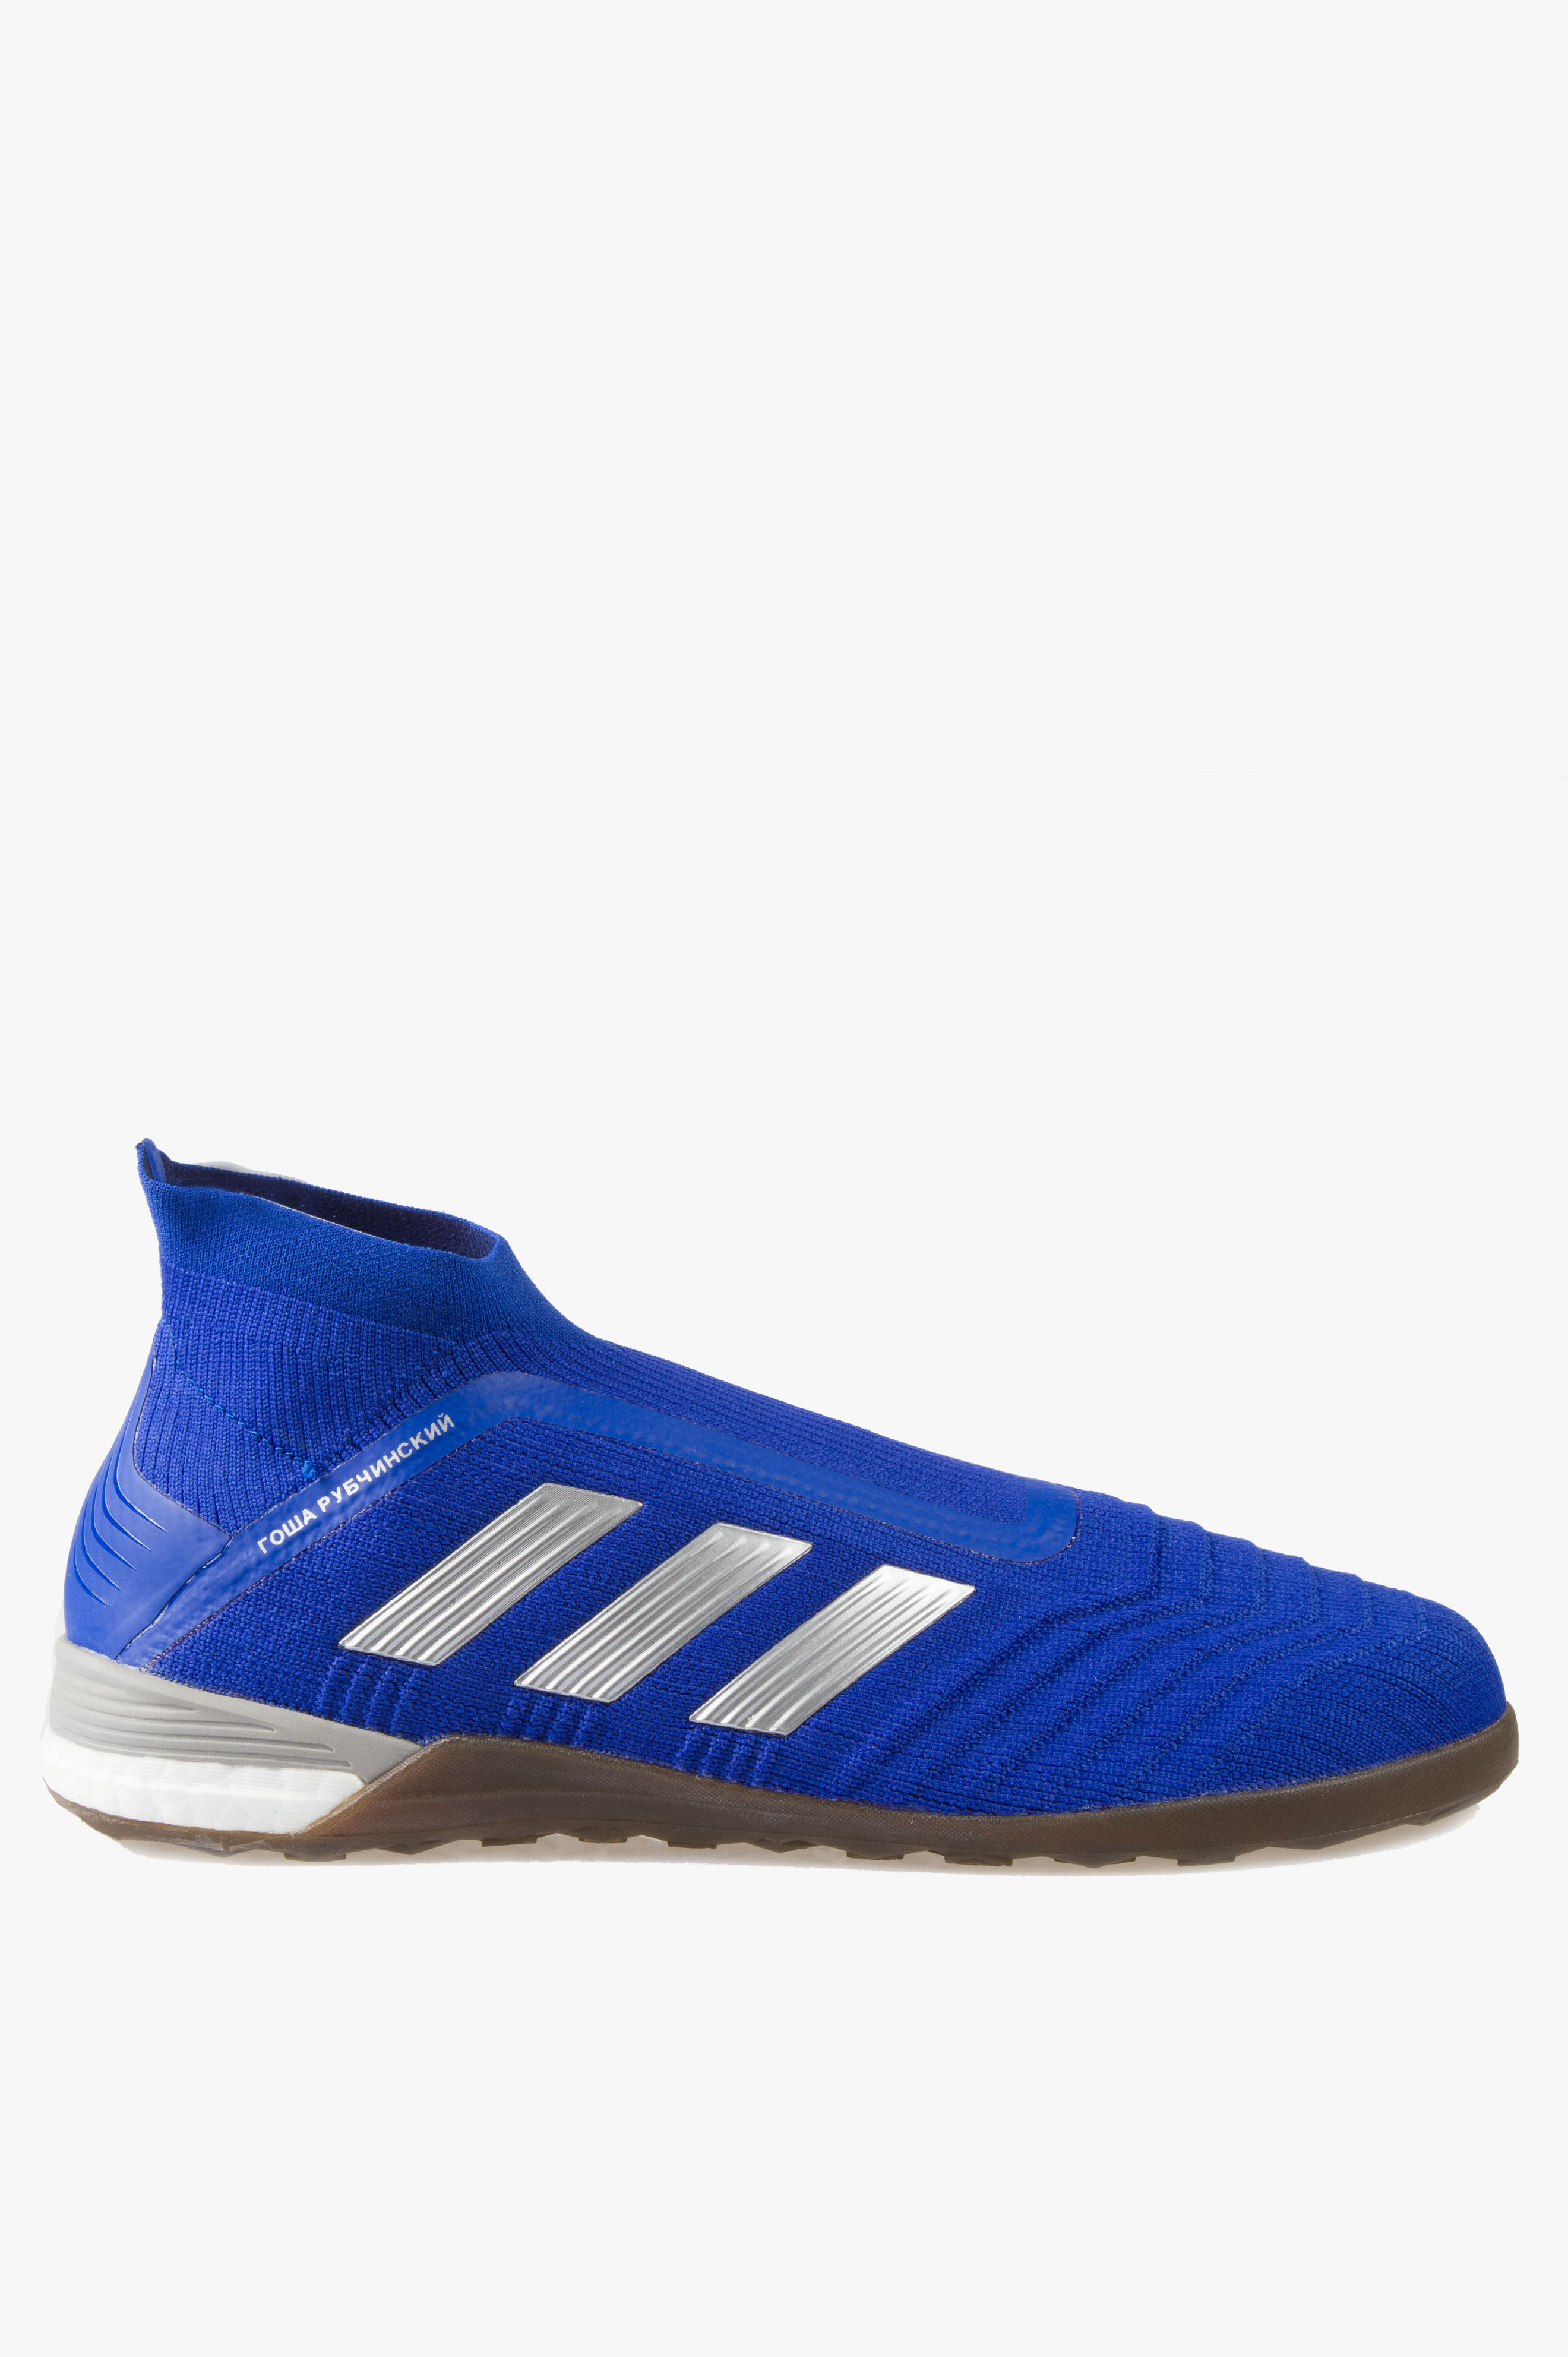 x Adidas Predator Sneaker Blue